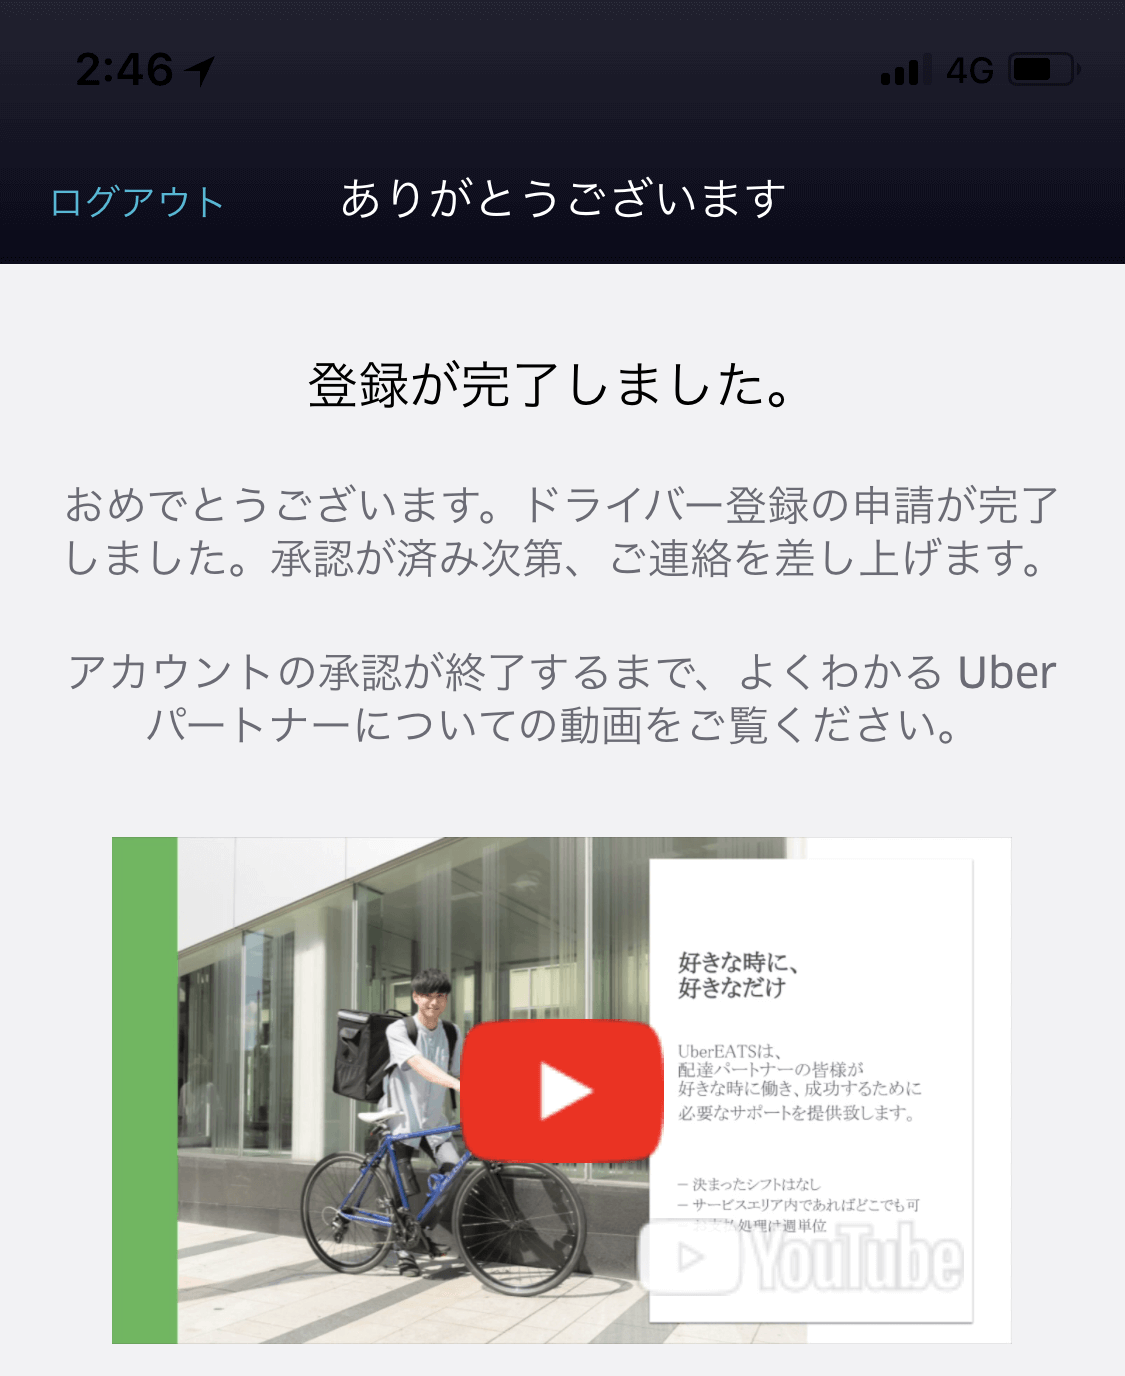 Uber Eats配達員書類アップロード完了